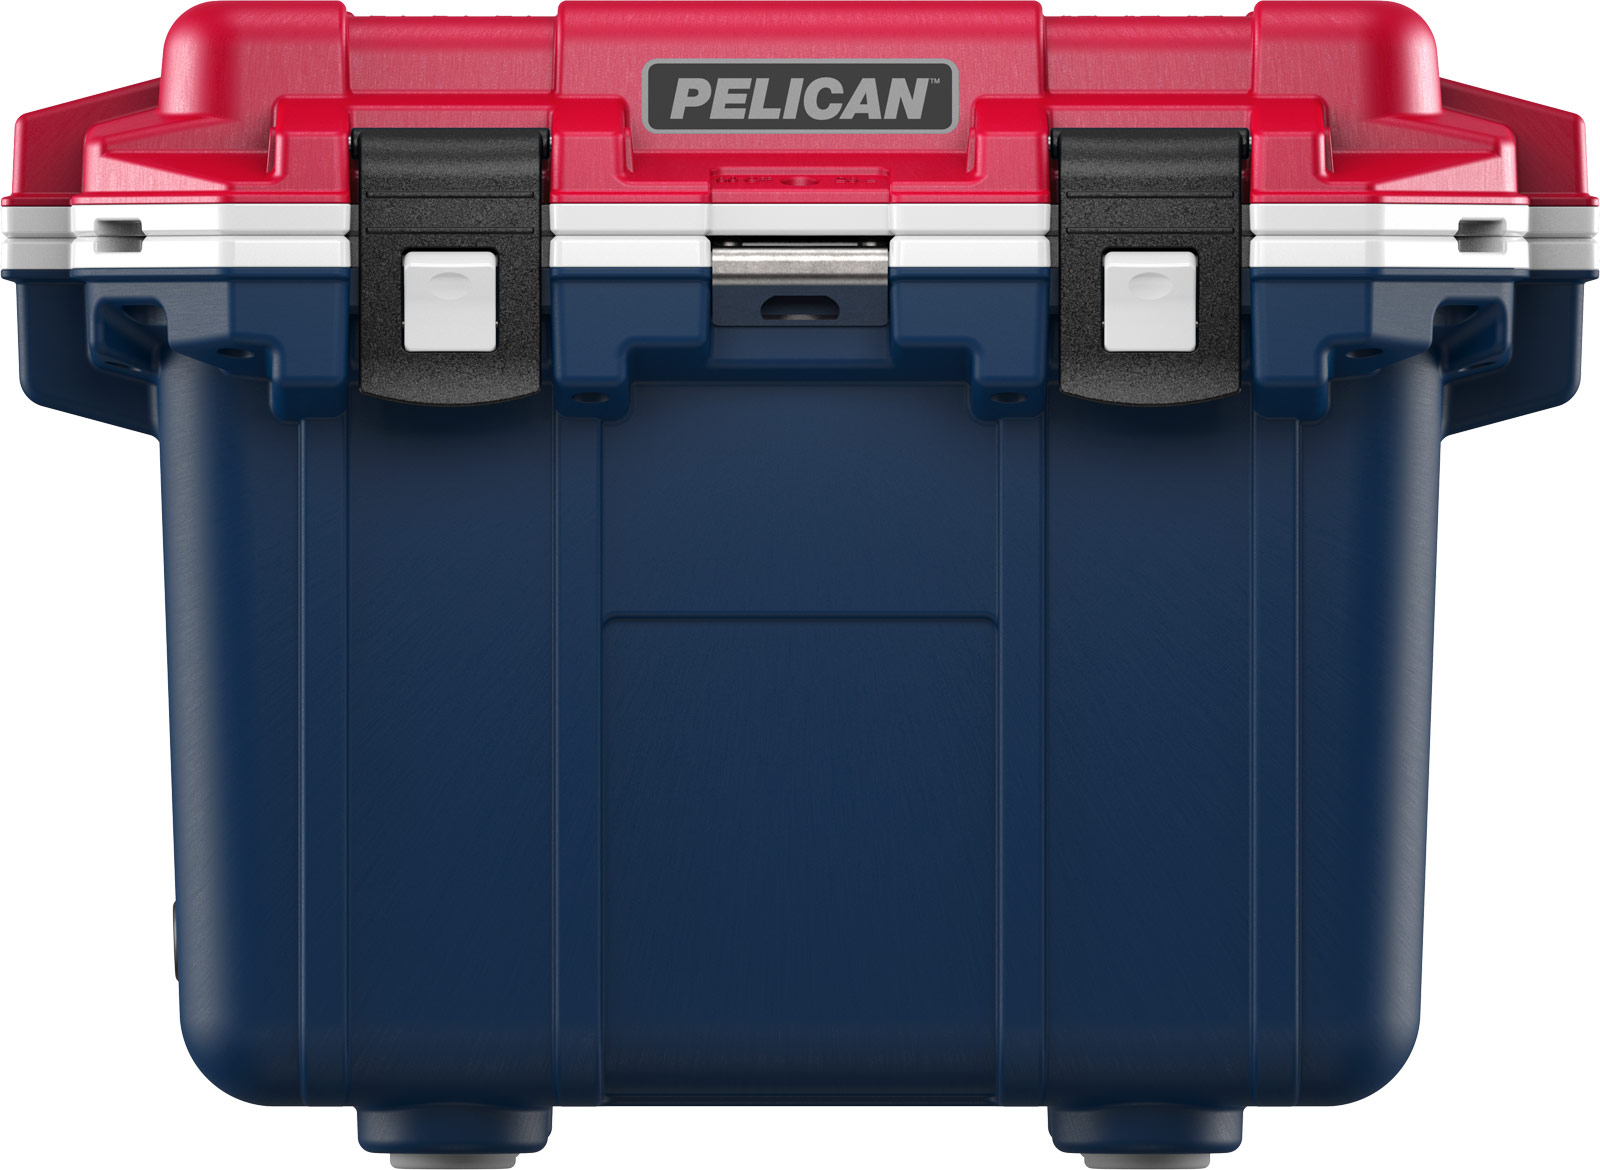 pelican drink cooler 30qt americana blue white red